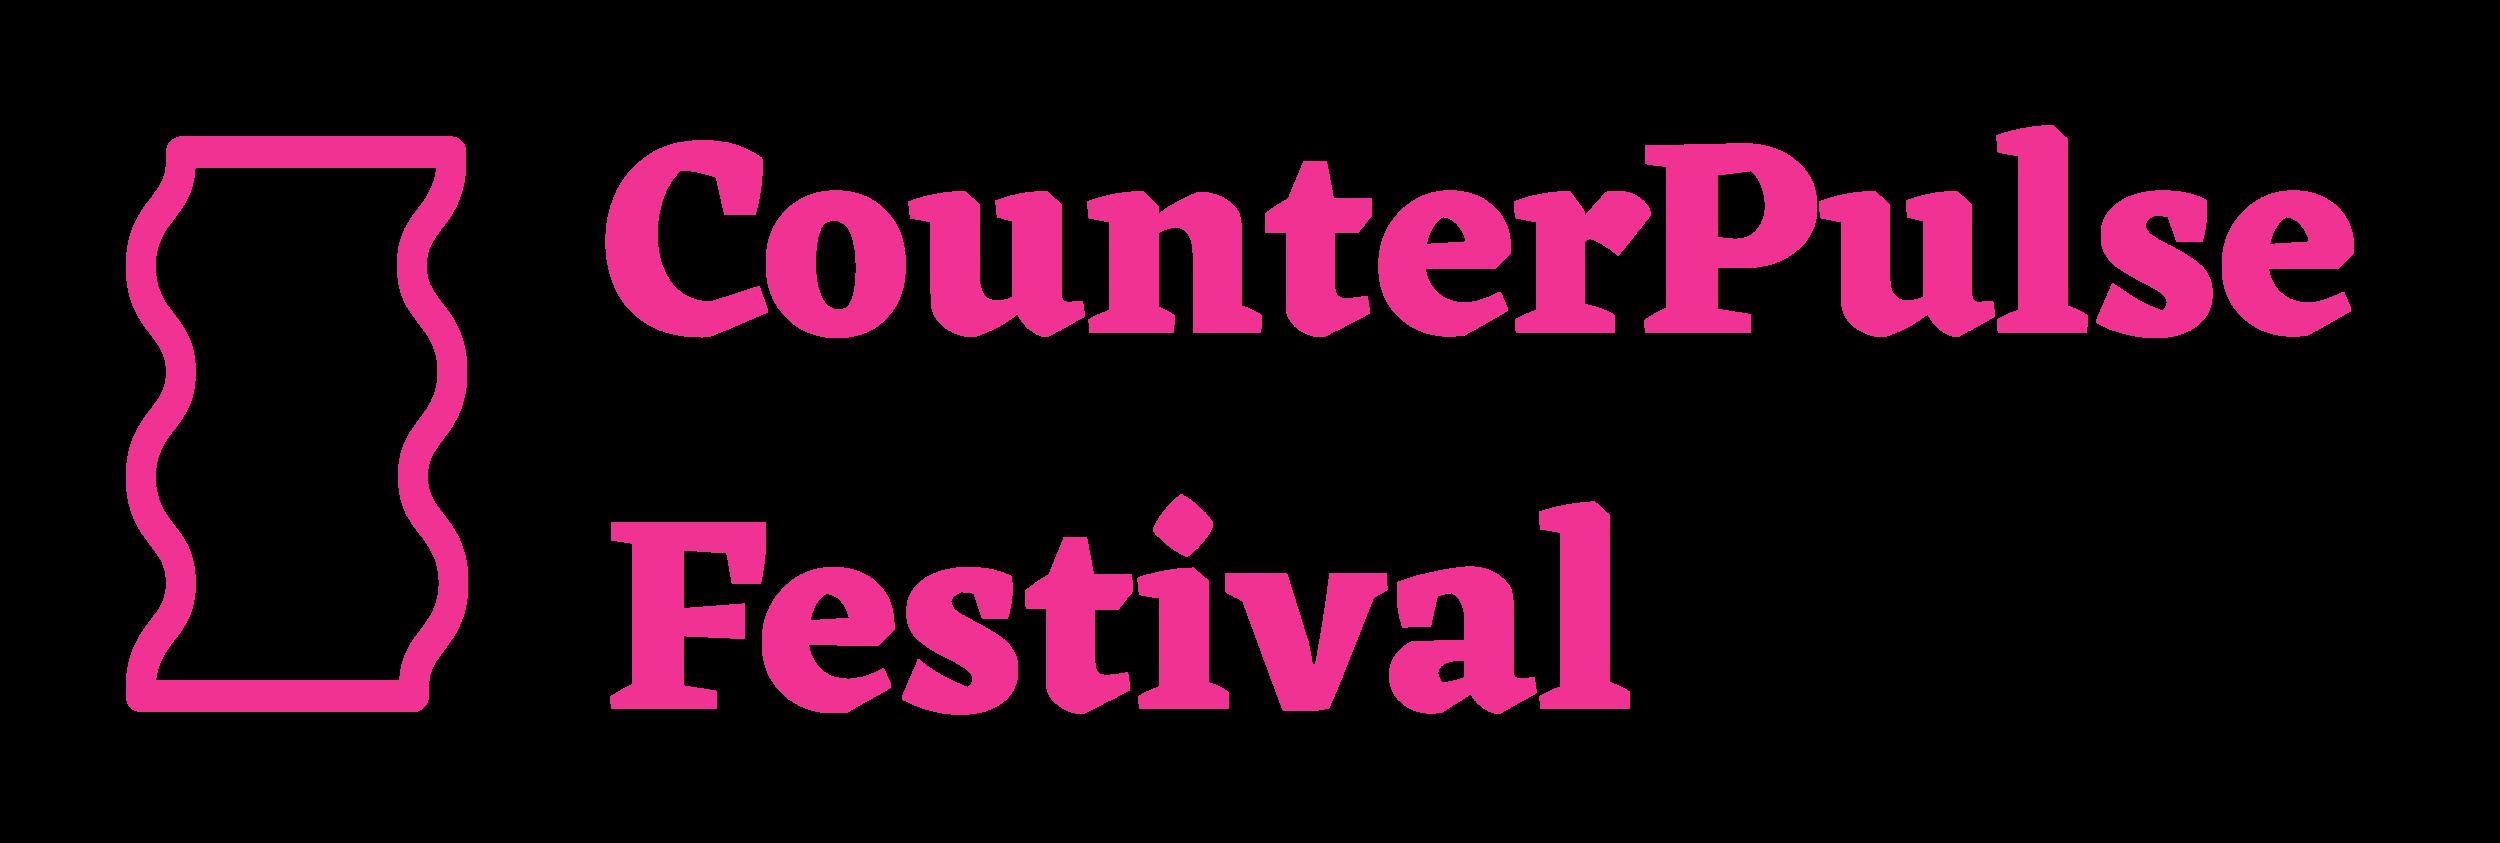 cp-fest-logo-pink-03.png